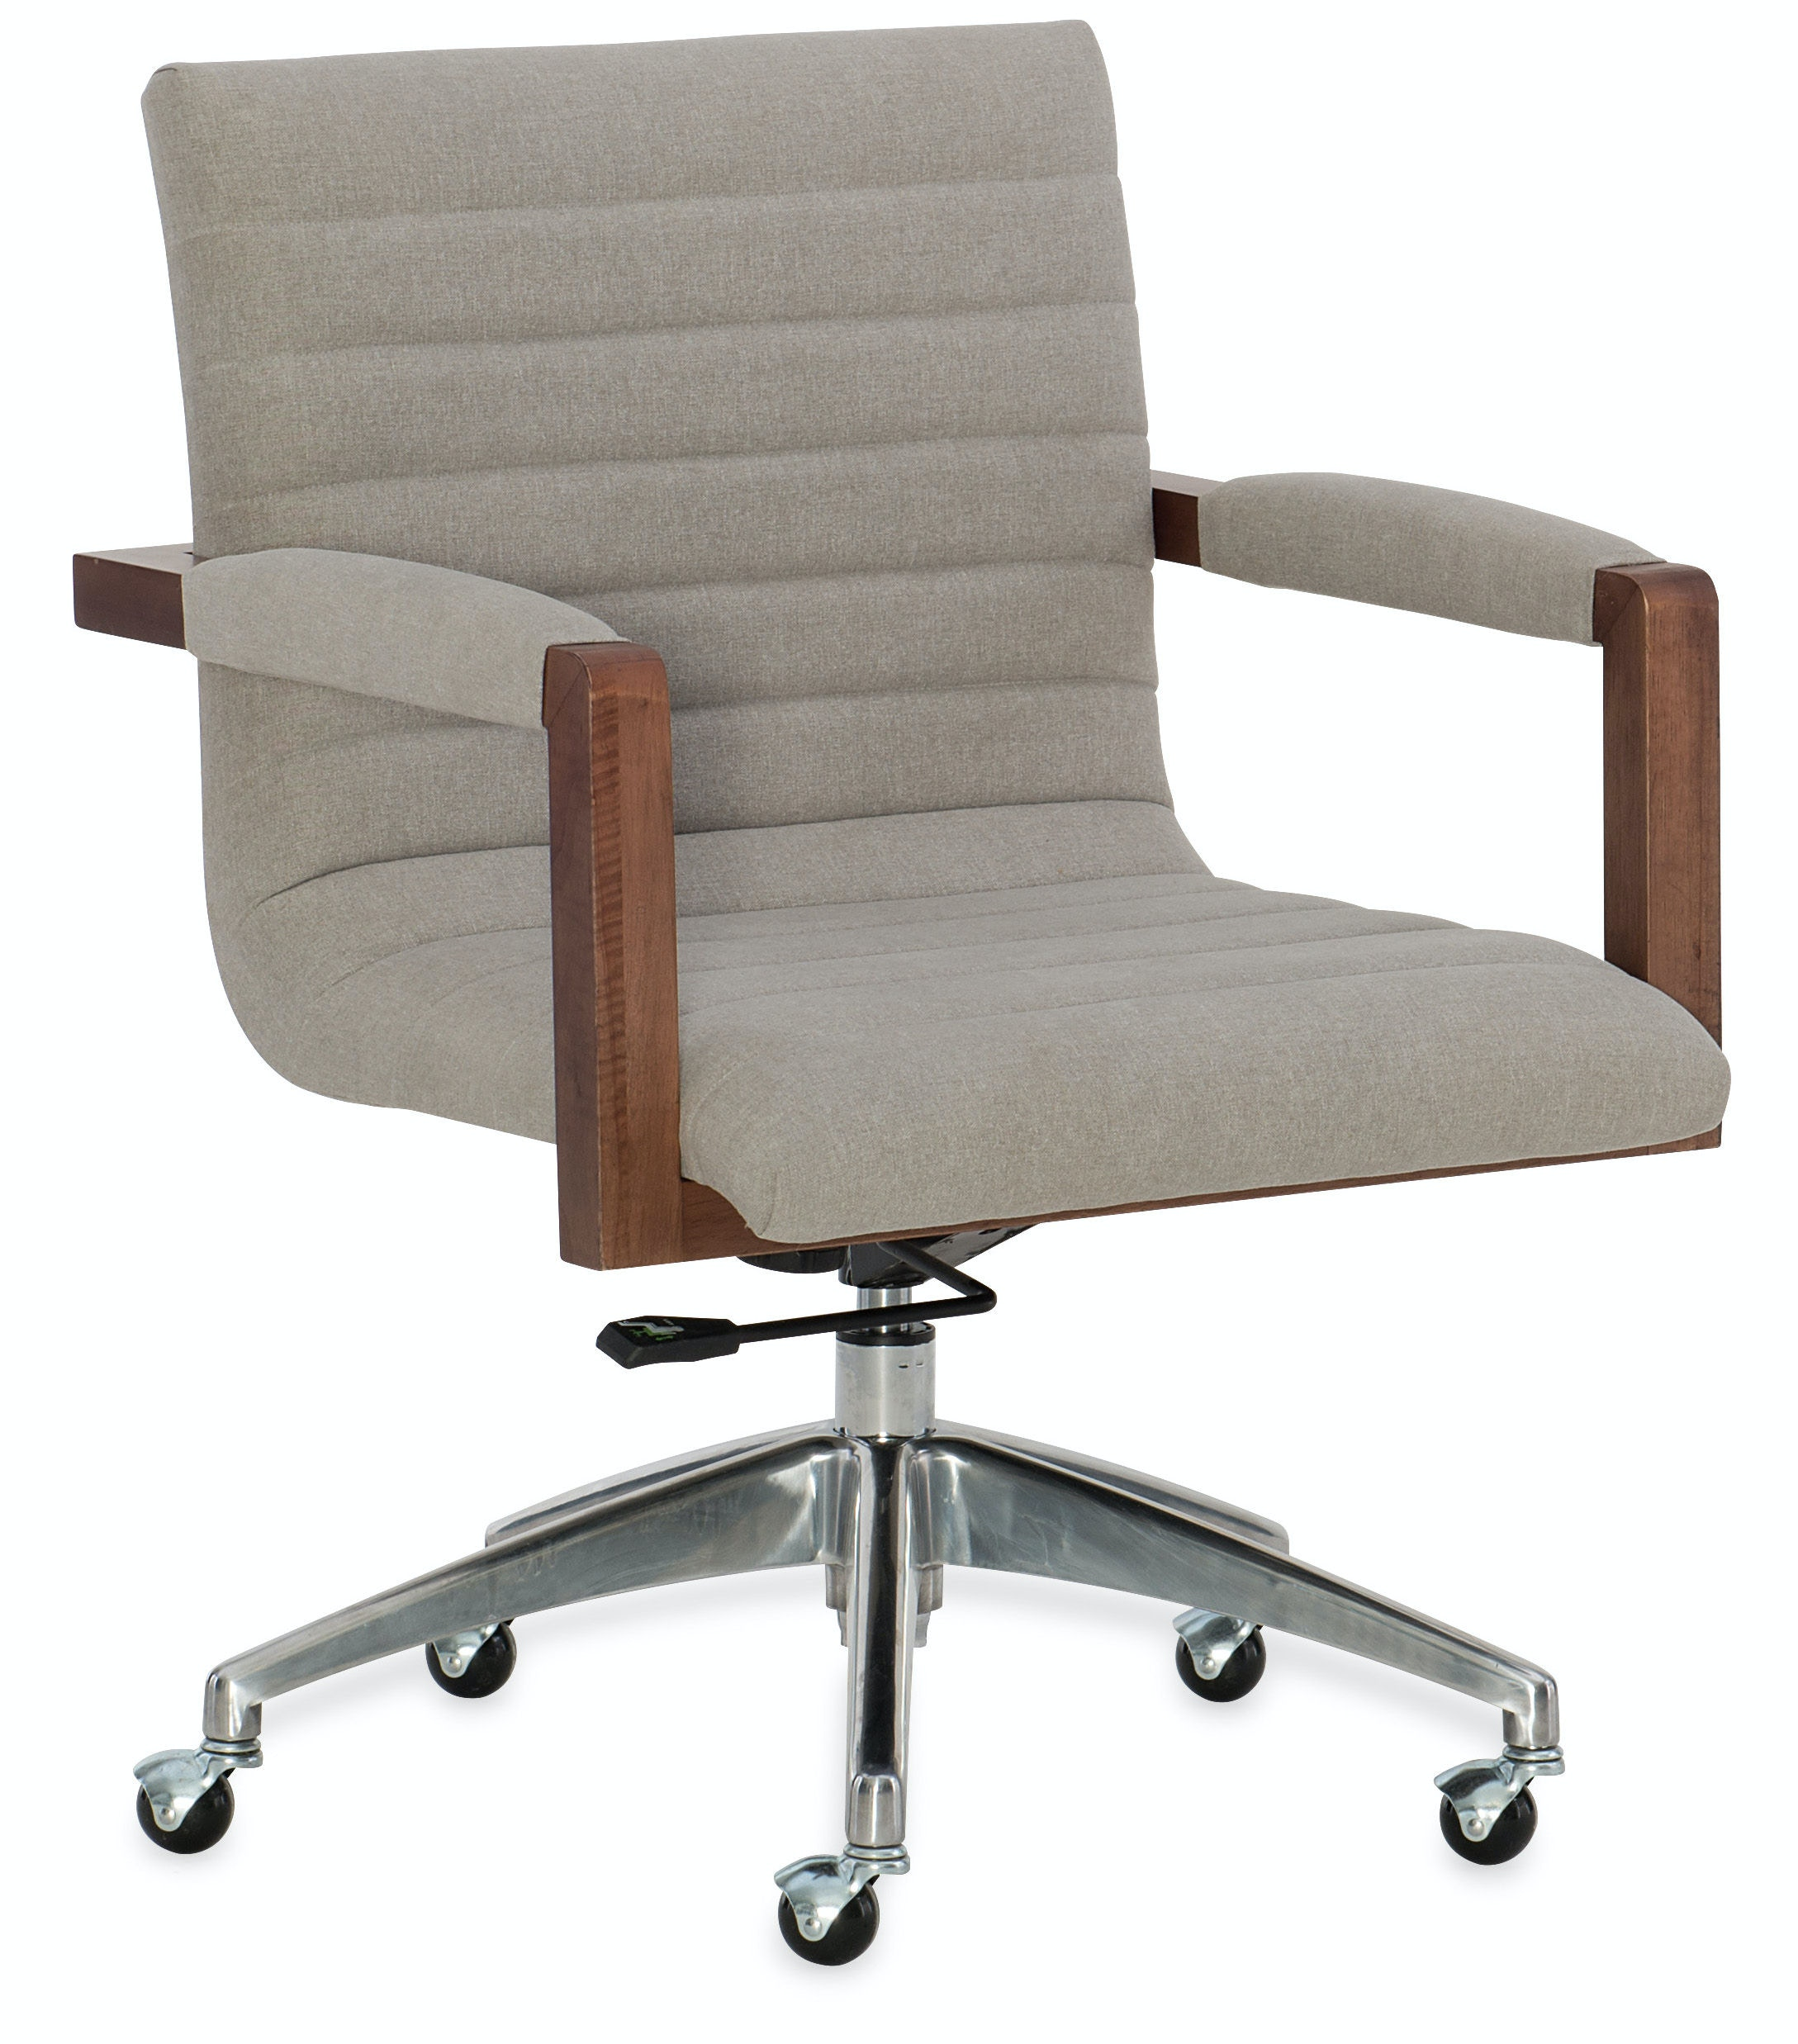 Charmant Hooker Furniture Elon Swivel Desk Chair 1650 30220 MWD